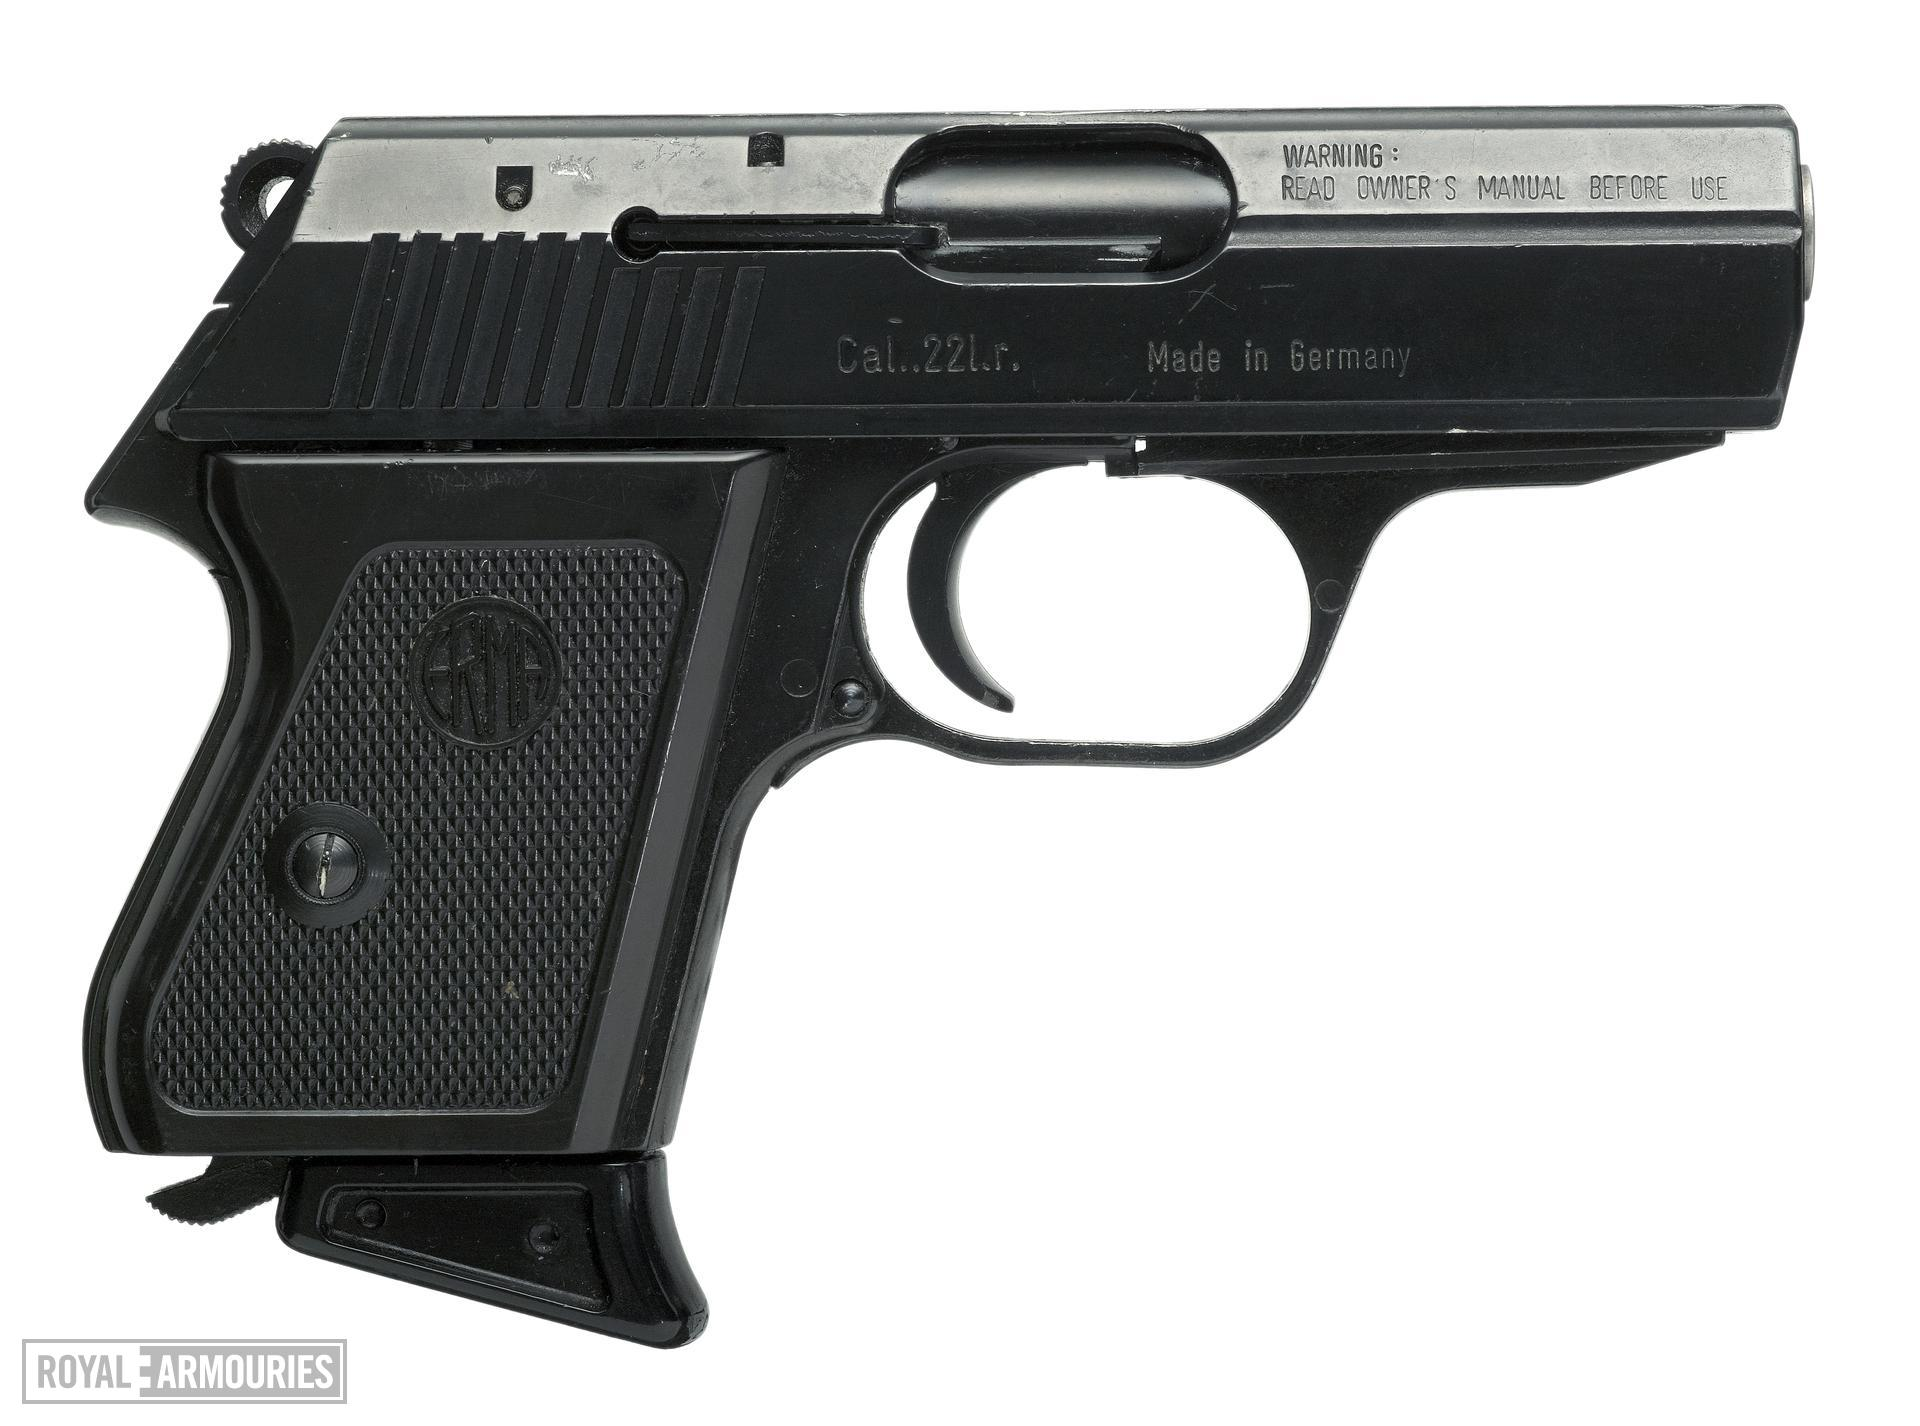 Rimfire self-loading pistol - Erma Model EP 322